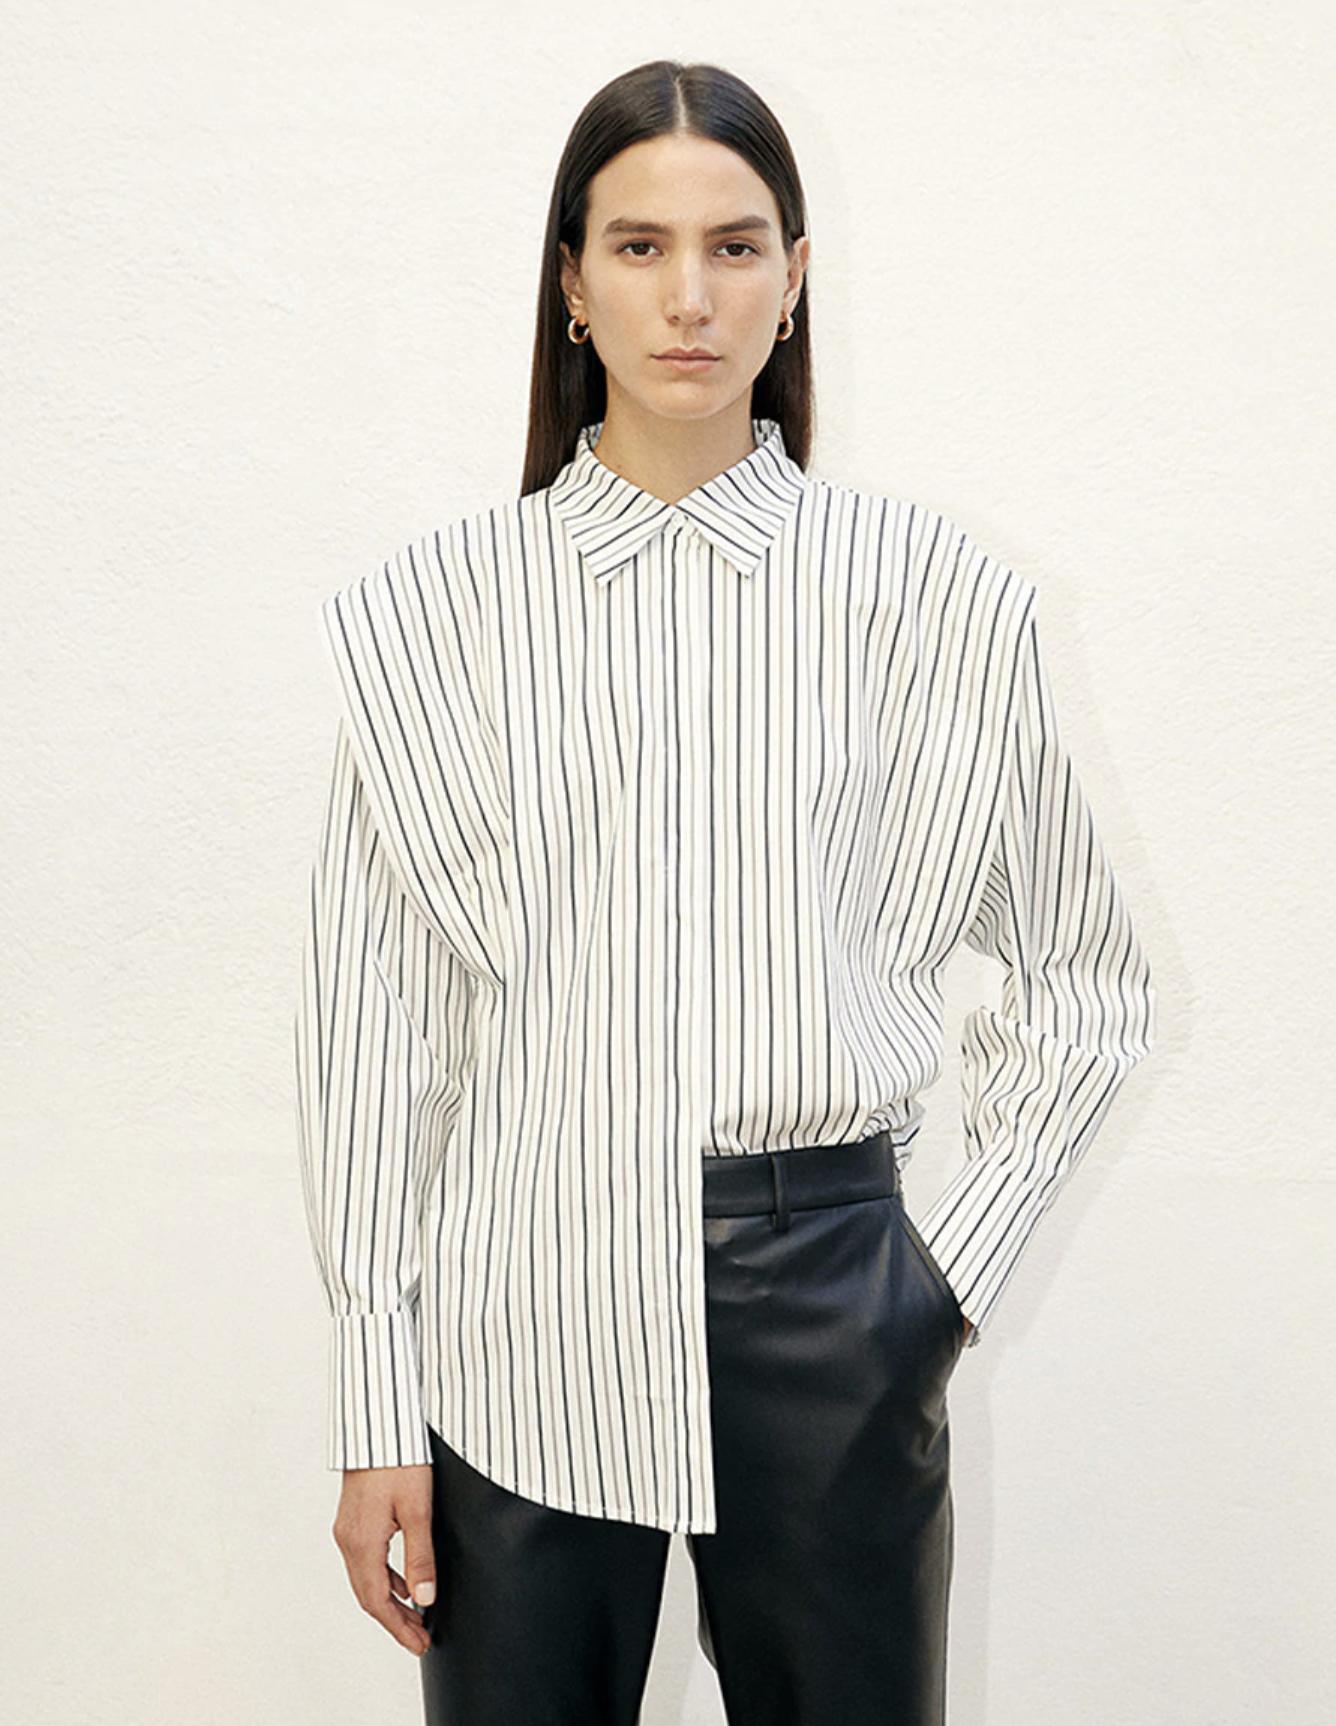 Camisa de manga larga de mujer de rayas